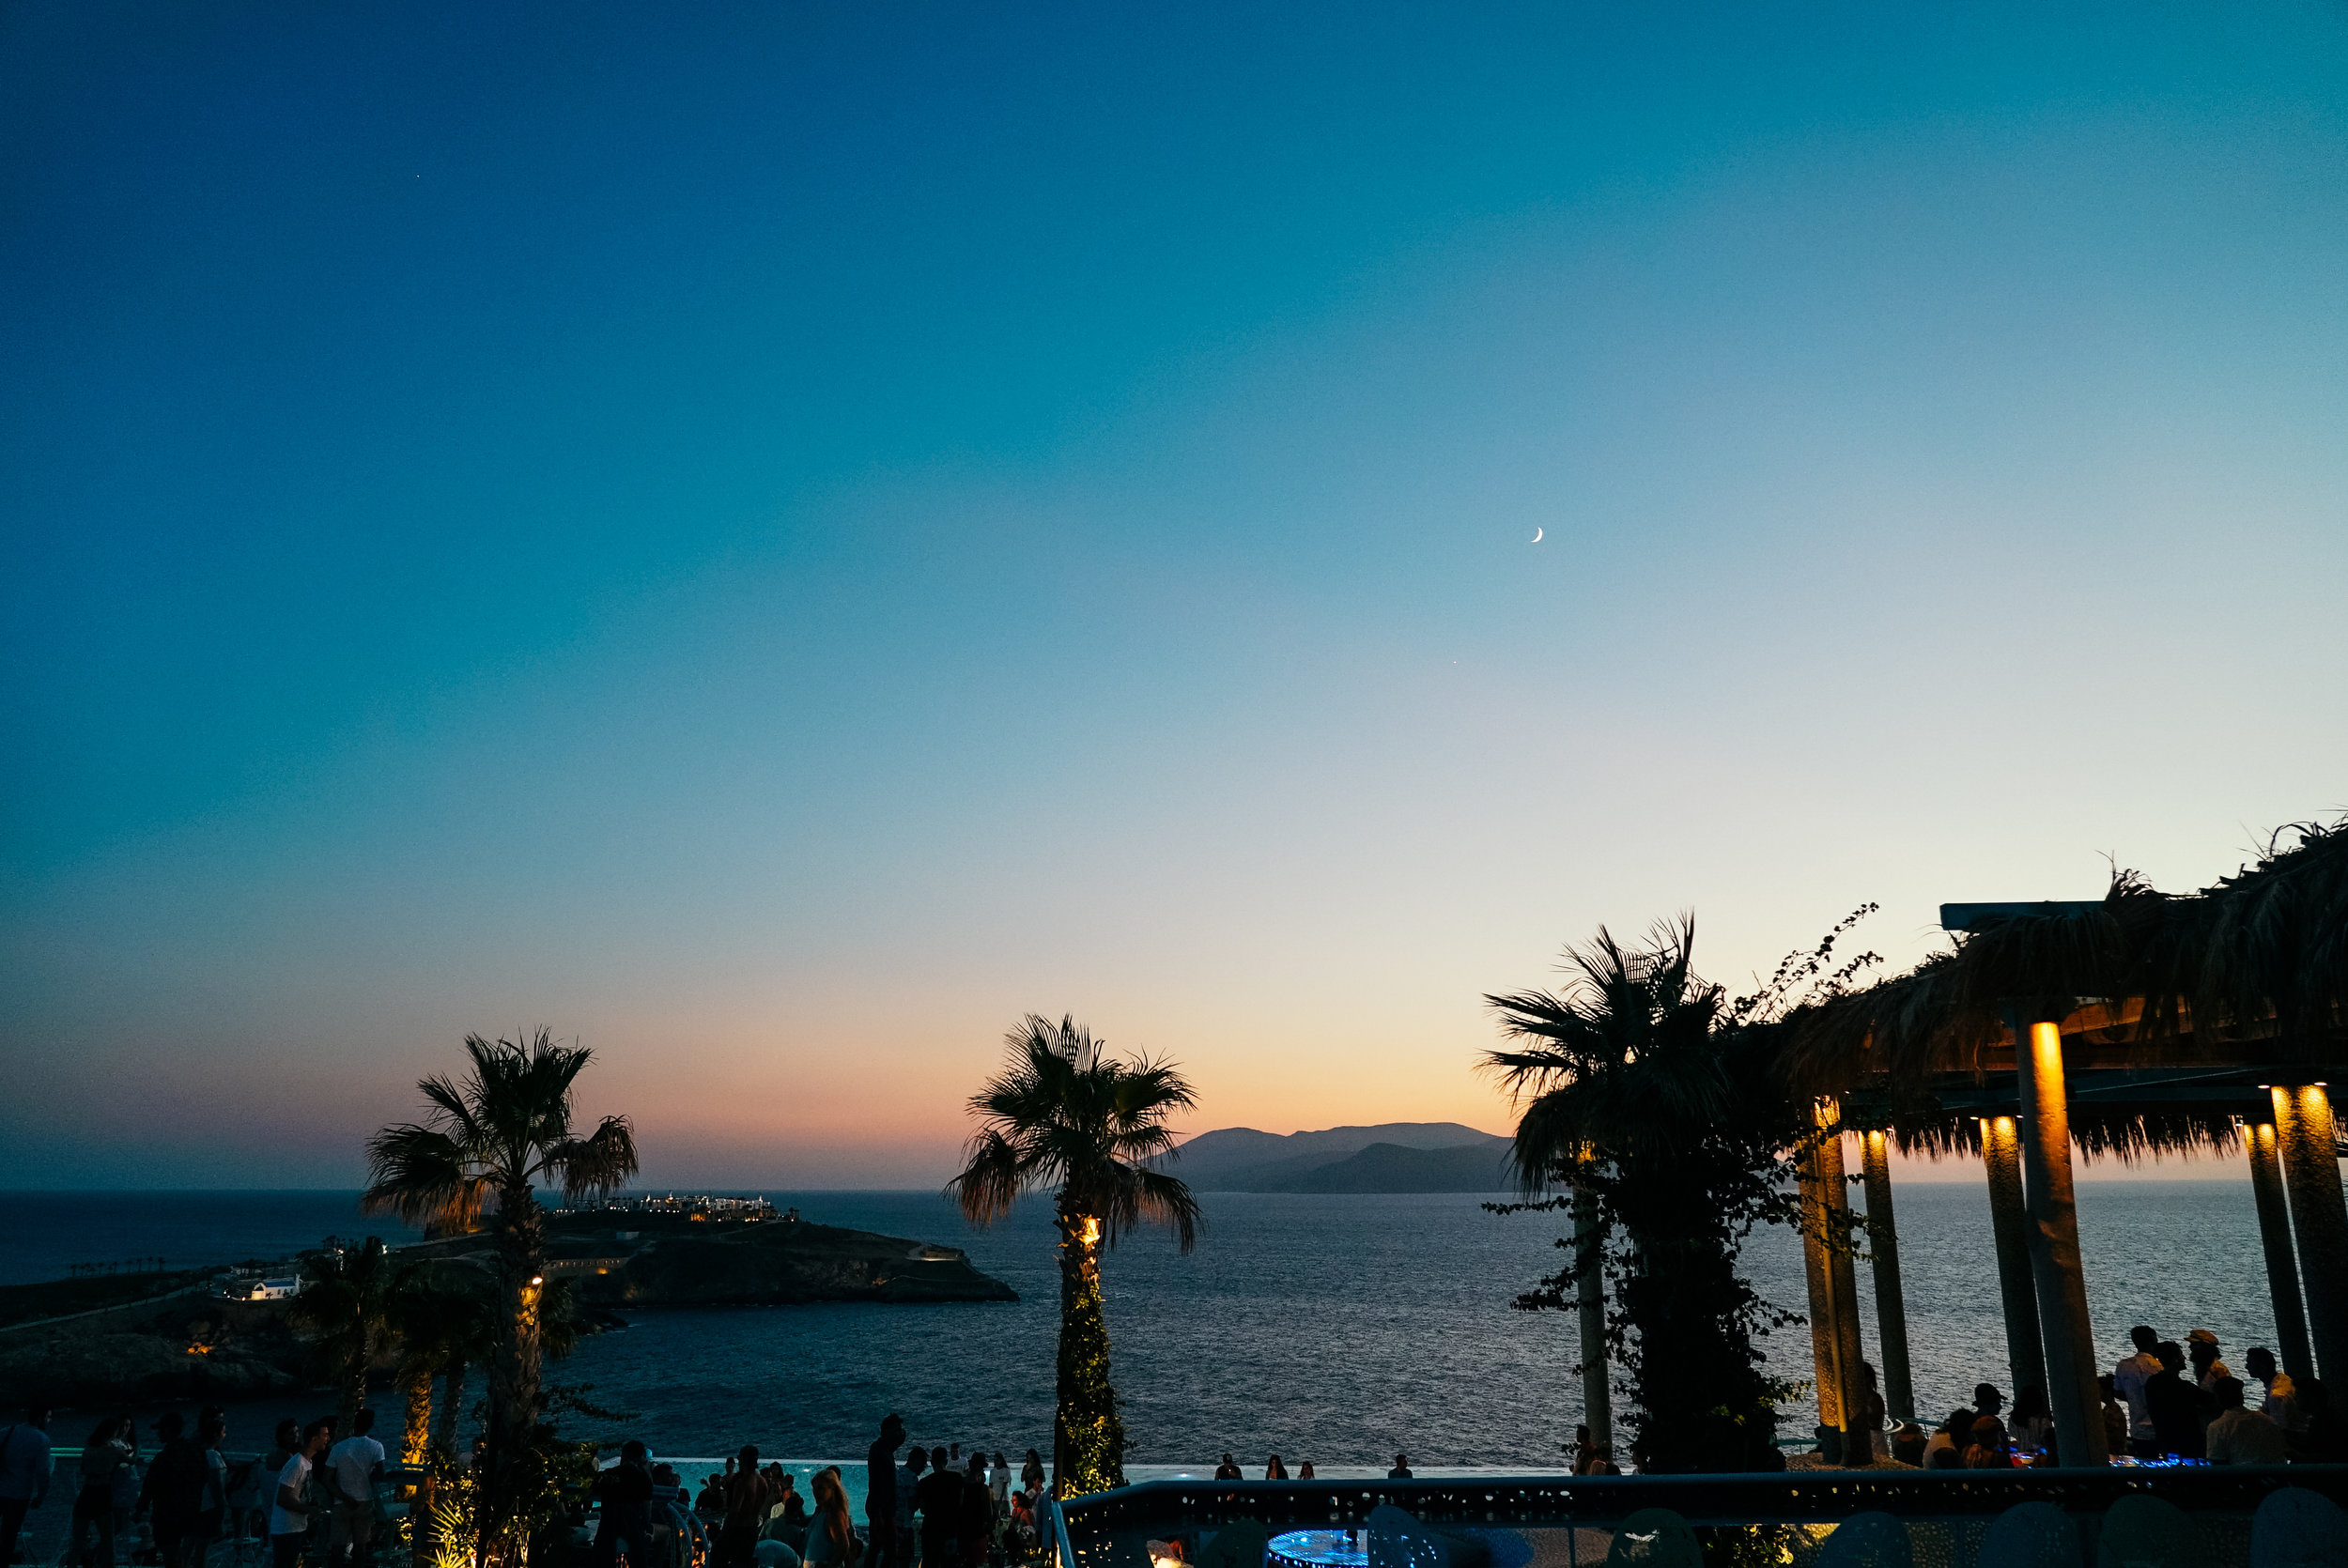 Pathos Bar at sunset